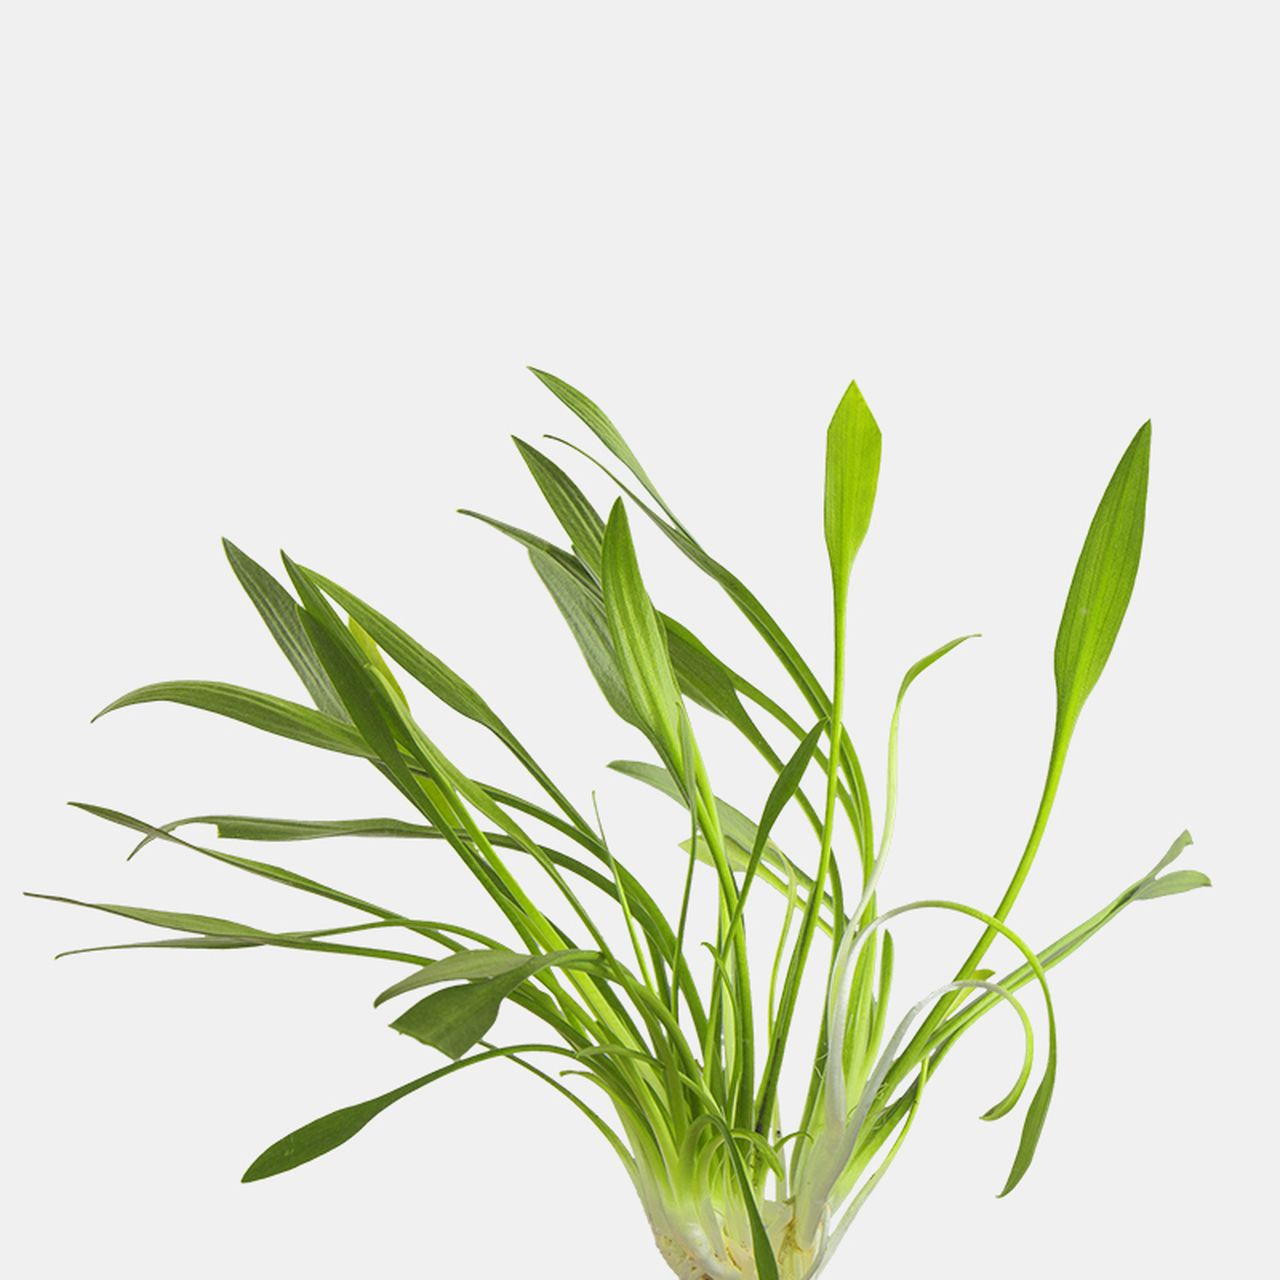 Cryptocoryne Parva - Set of 2 Plants | Plants, Freshwater